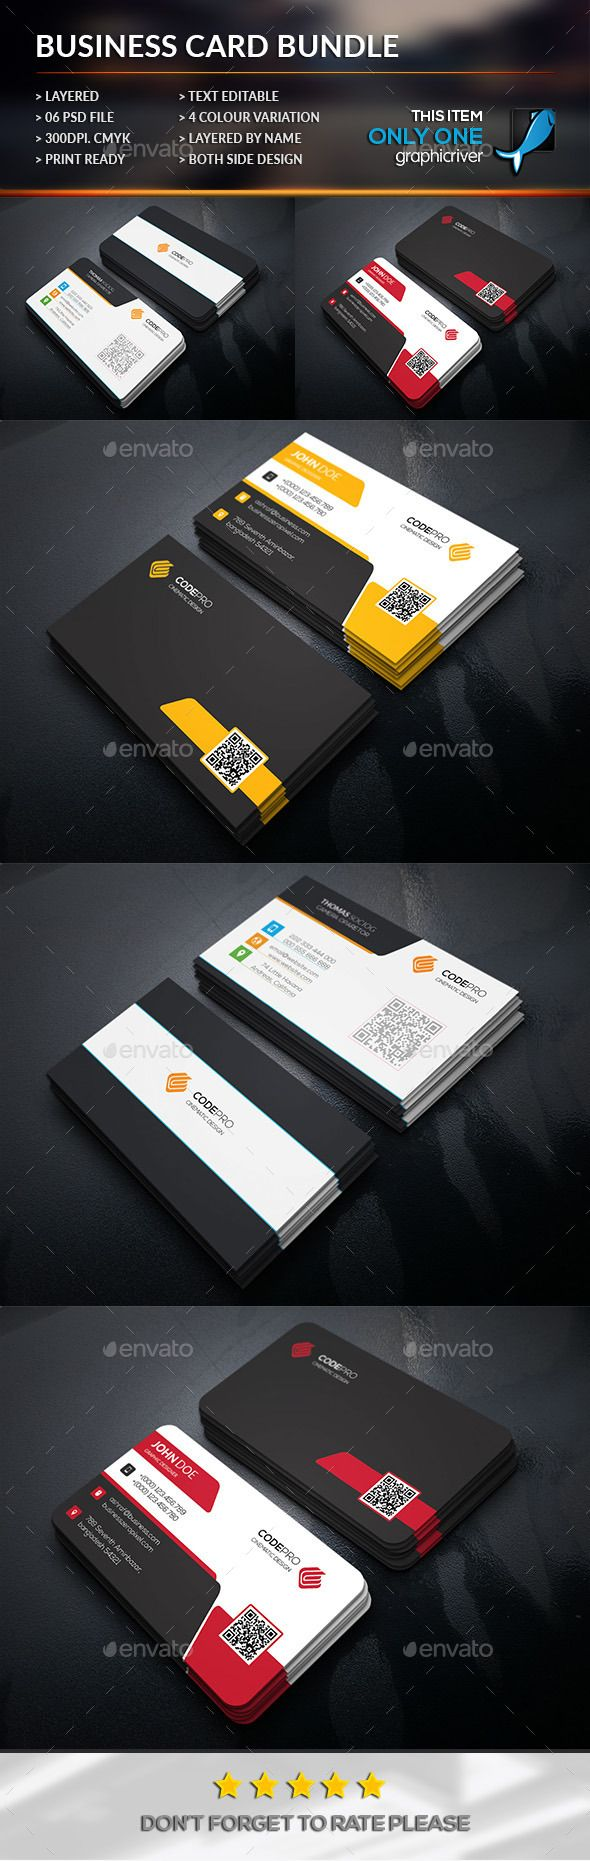 Simply Business Card Bundle Template #print #design Download: http://graphicriver.net/item/simply-business-card-bundle/12043353?ref=ksioks